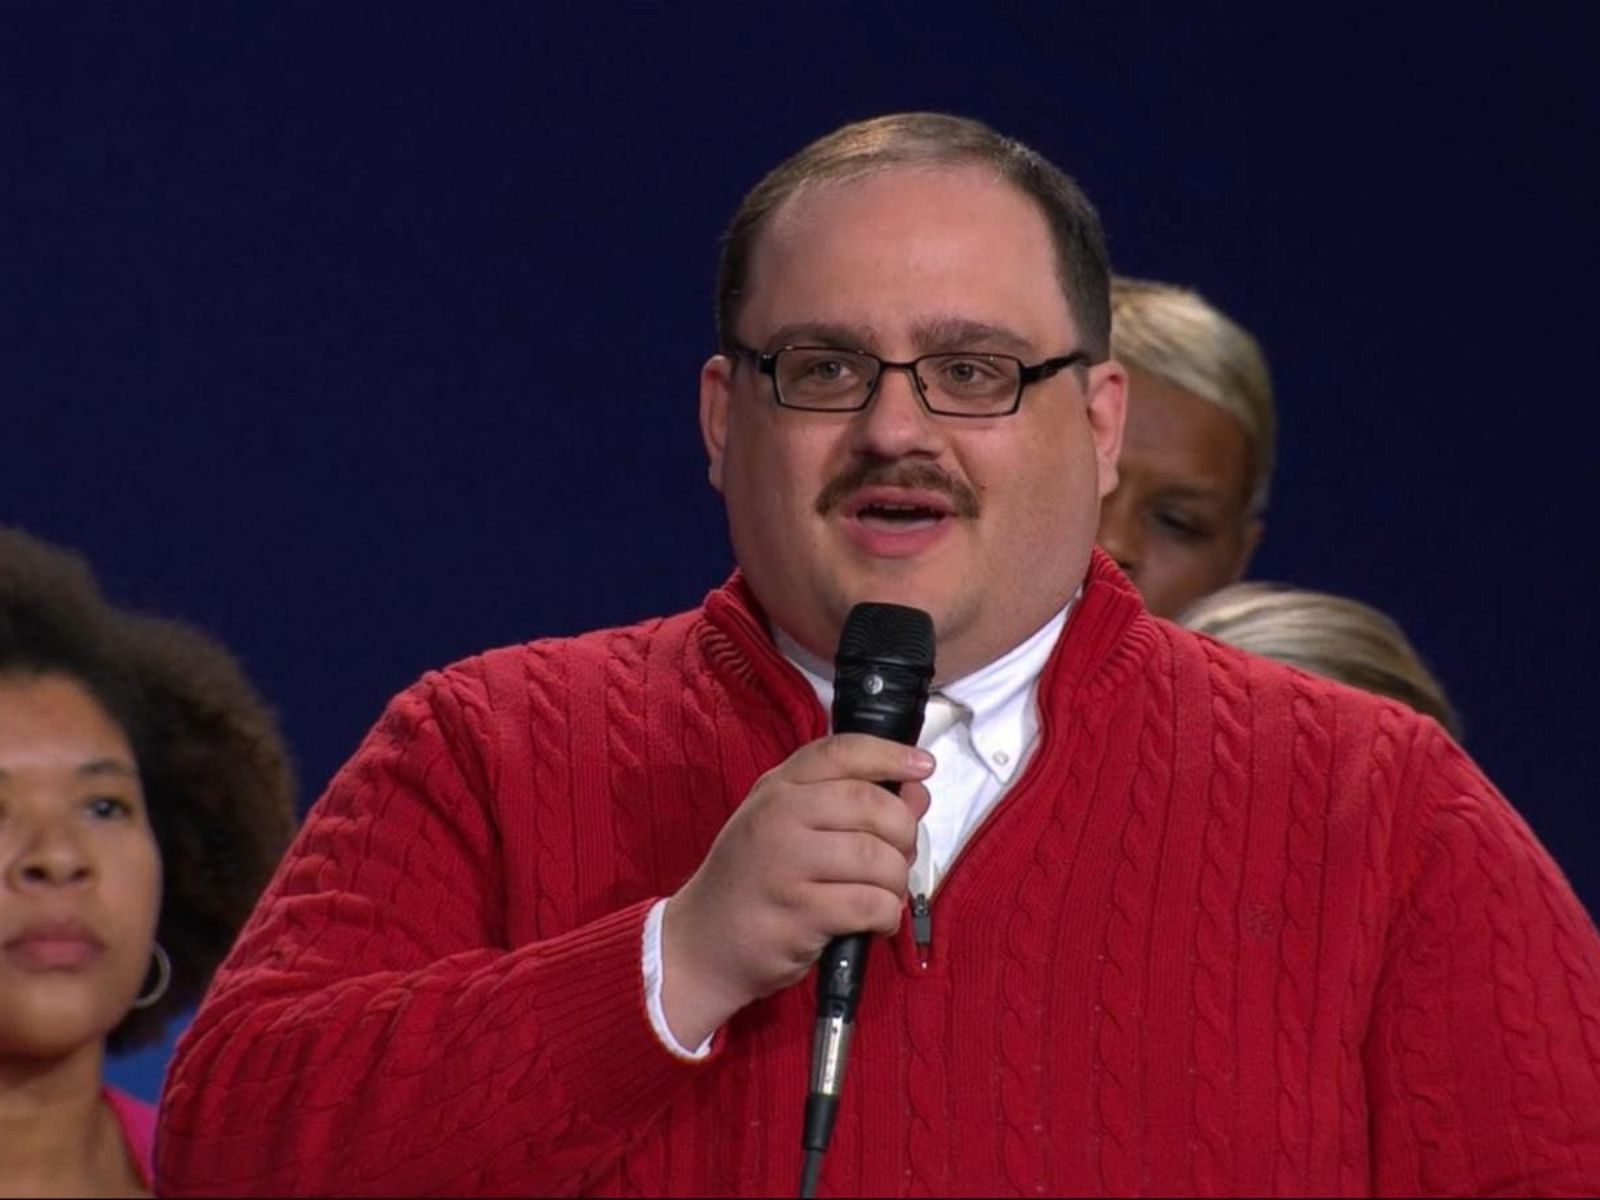 The Internet Thinks Undecided Voter Ken Bone Is the Debate's Real Winner